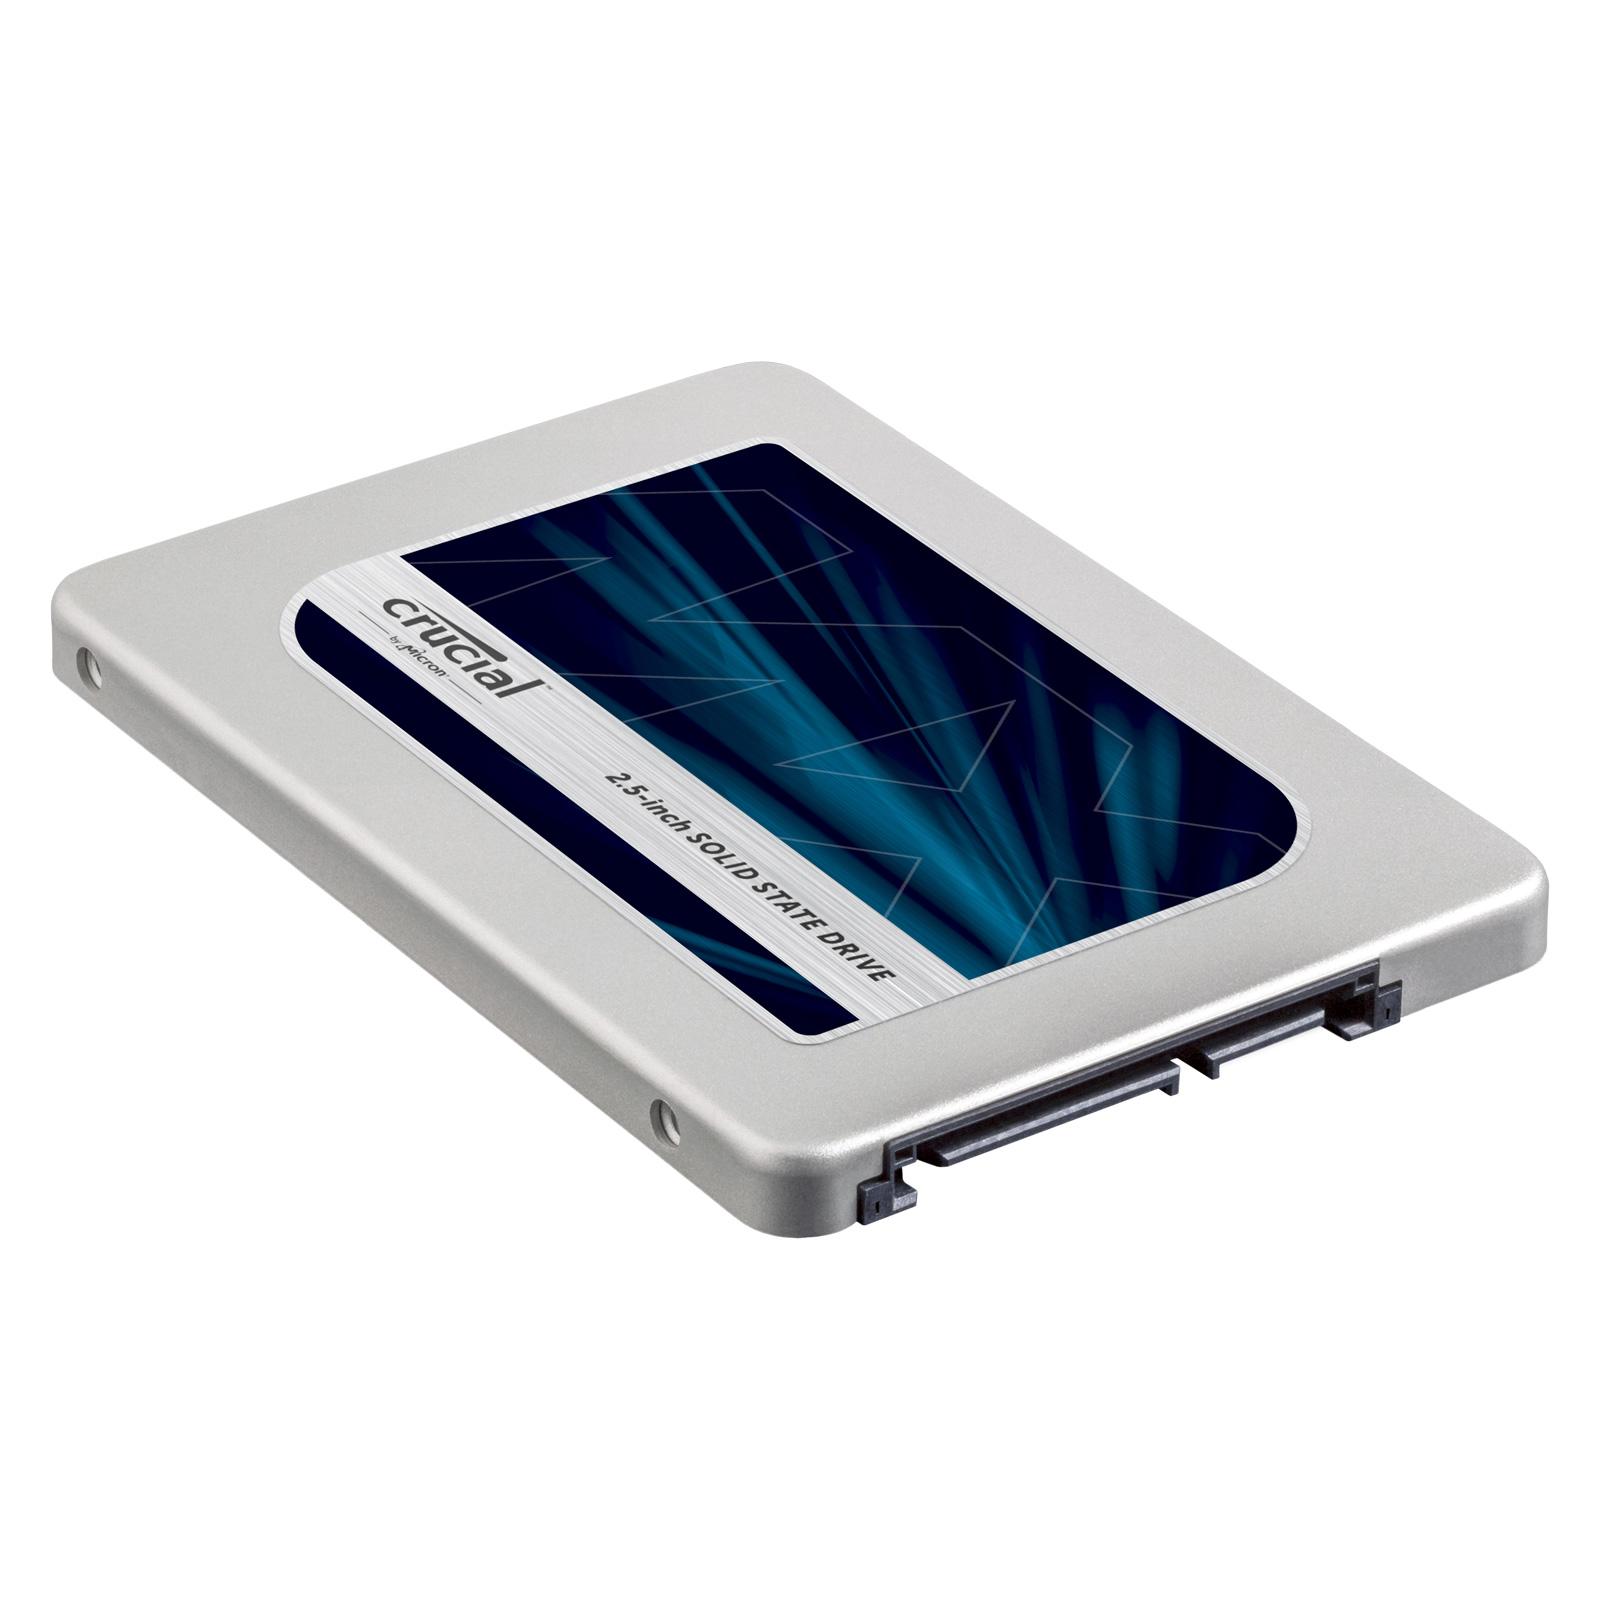 "Disque SSD Crucial MX300 750 Go SSD 750 Go 2.5"" 7mm Serial ATA 6Gb/s"